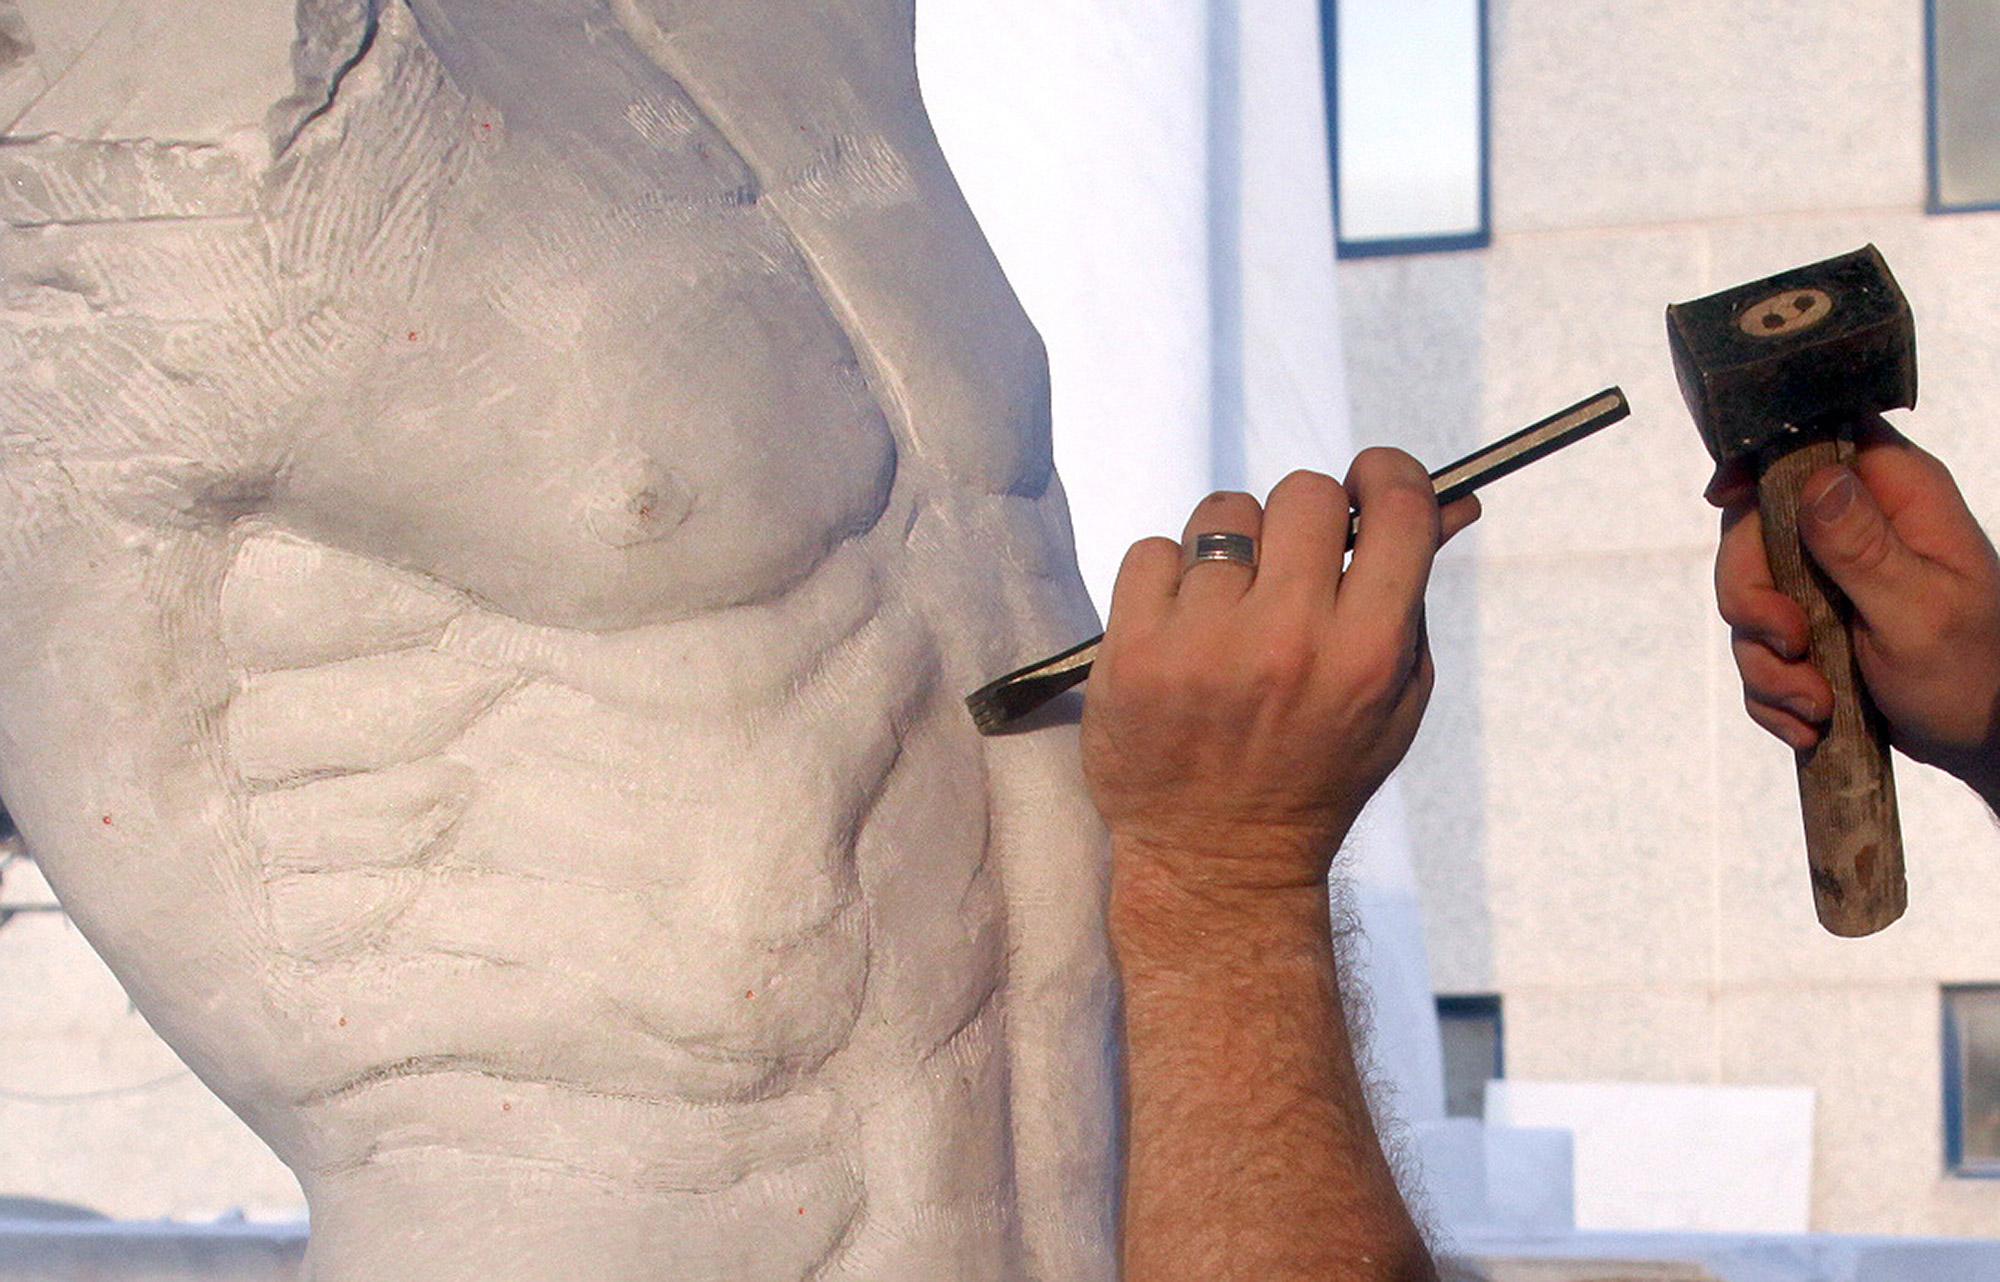 New-York-Academy-of-Art-Carrara-Residency-Joseph-Brickey20171213_0104.jpg